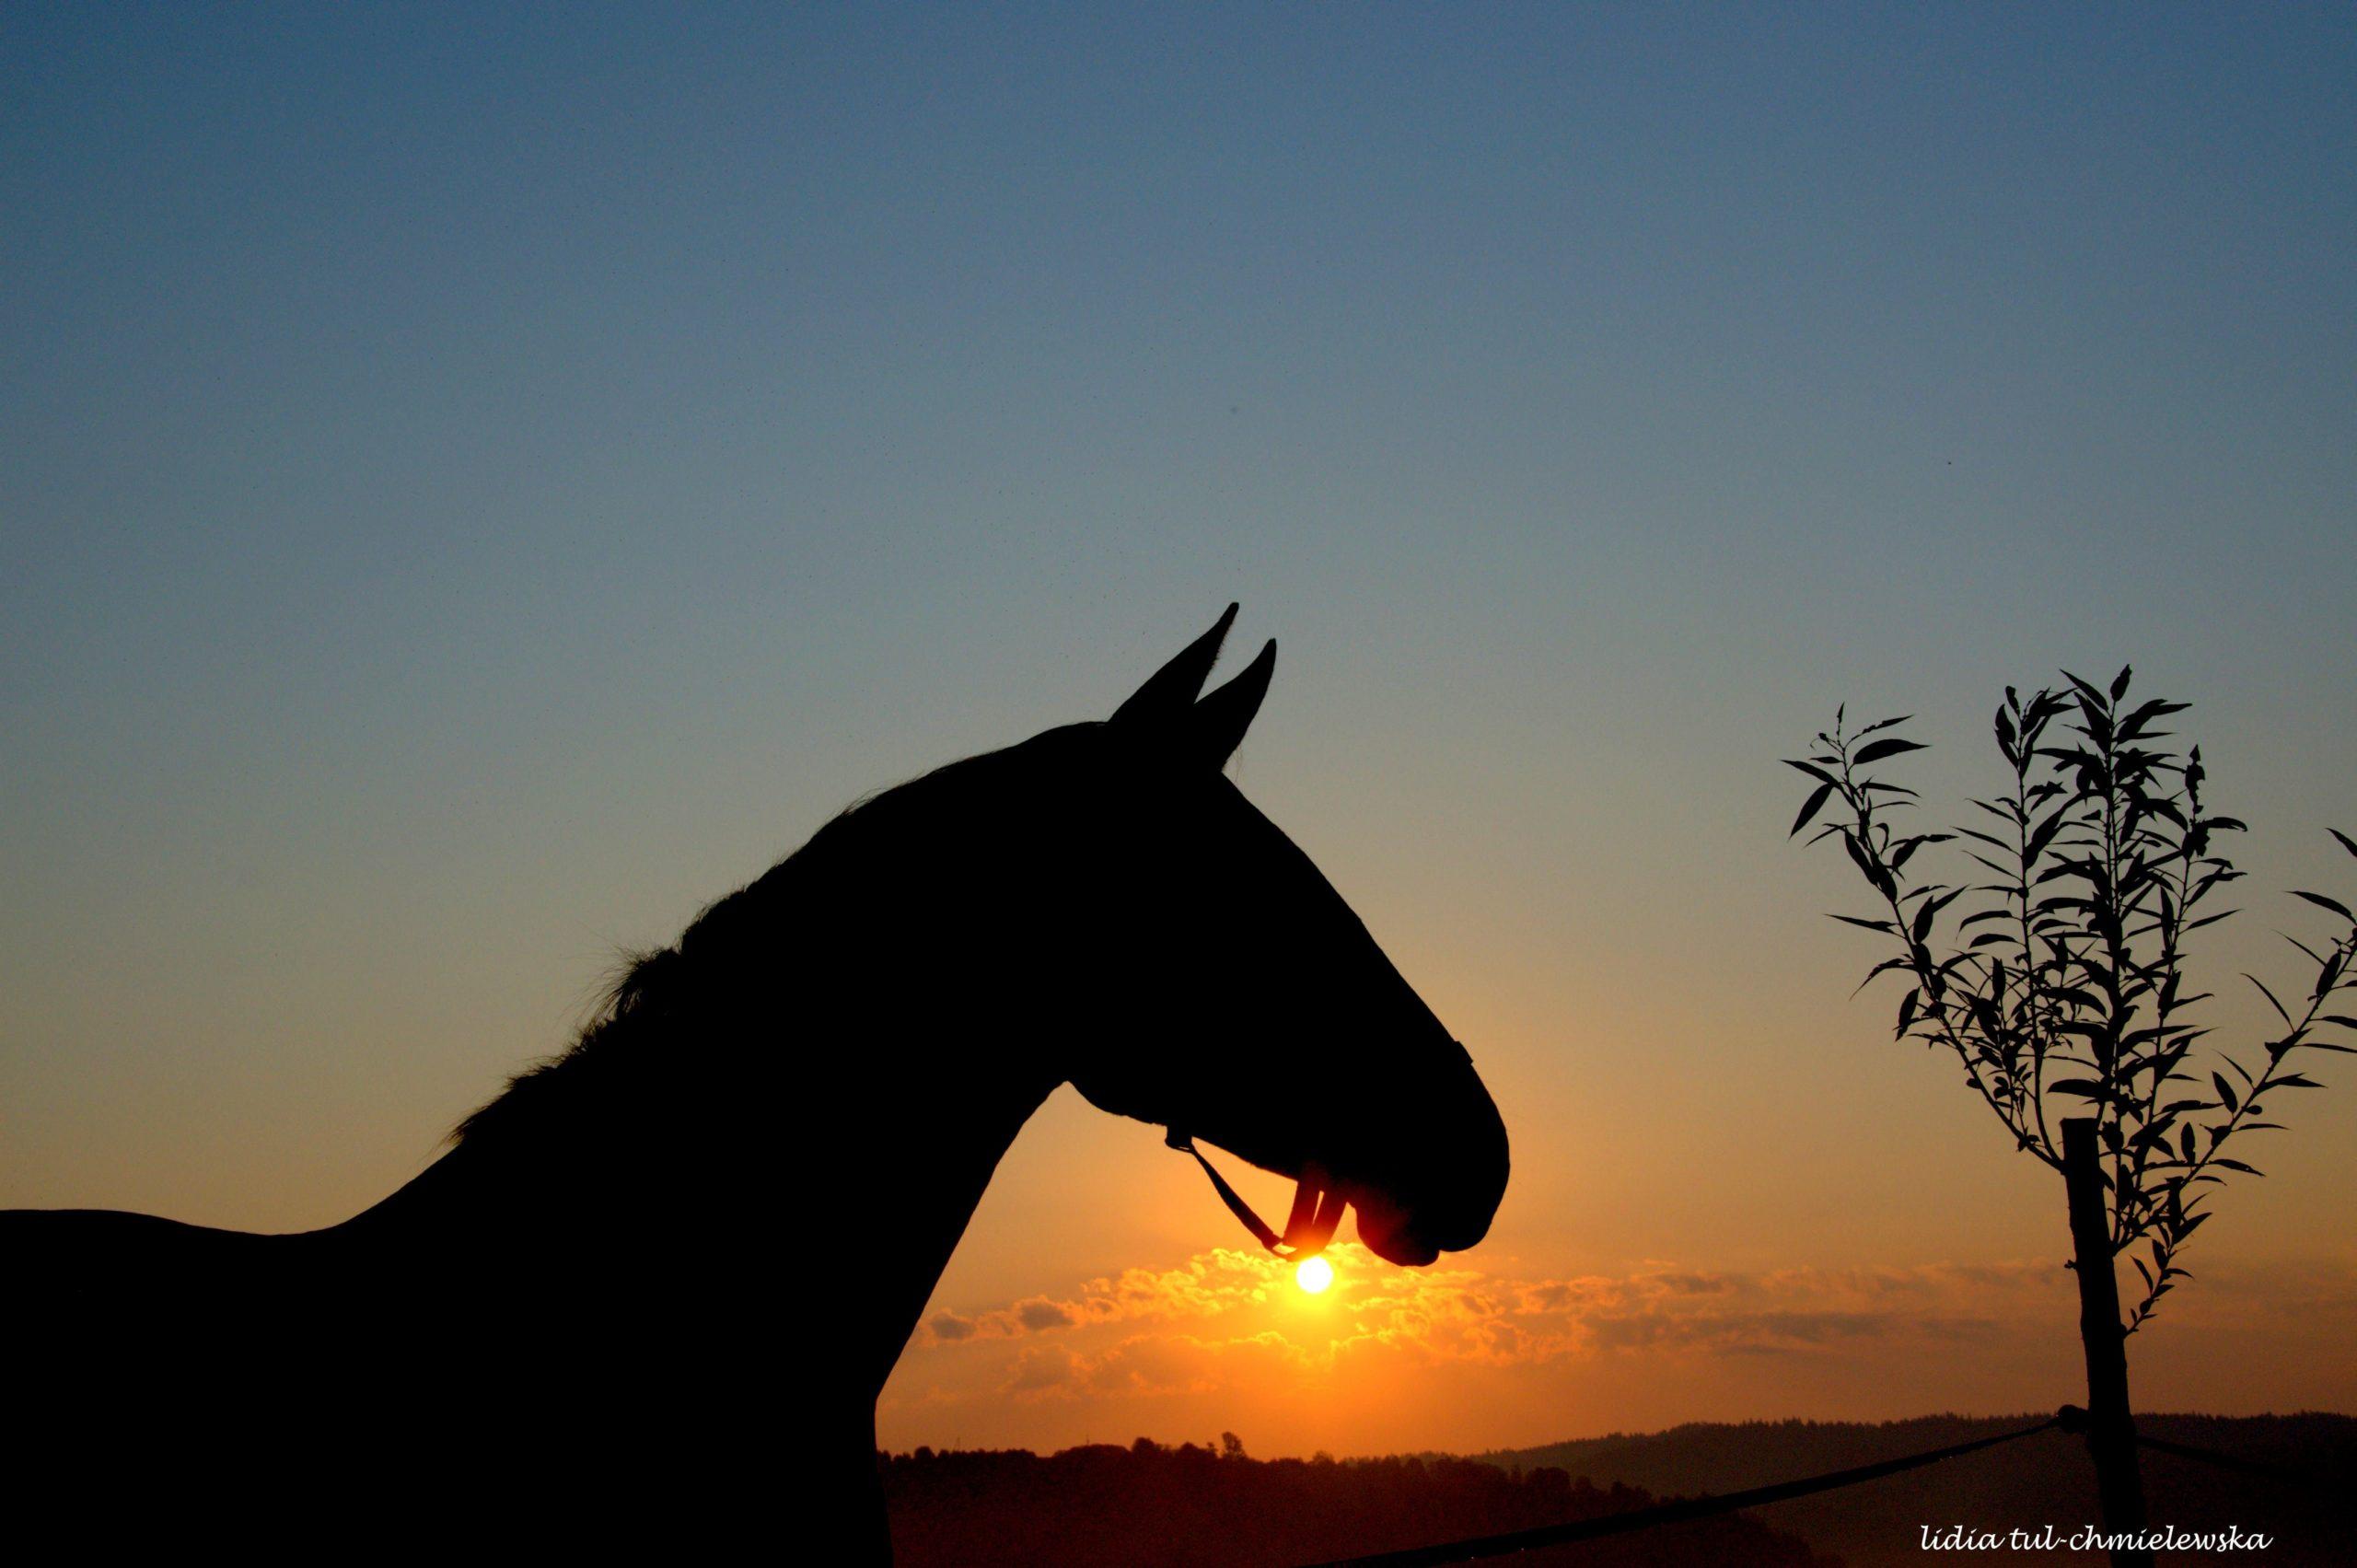 Swiatło i koń/fot. Lidia Tul-Chmielewska